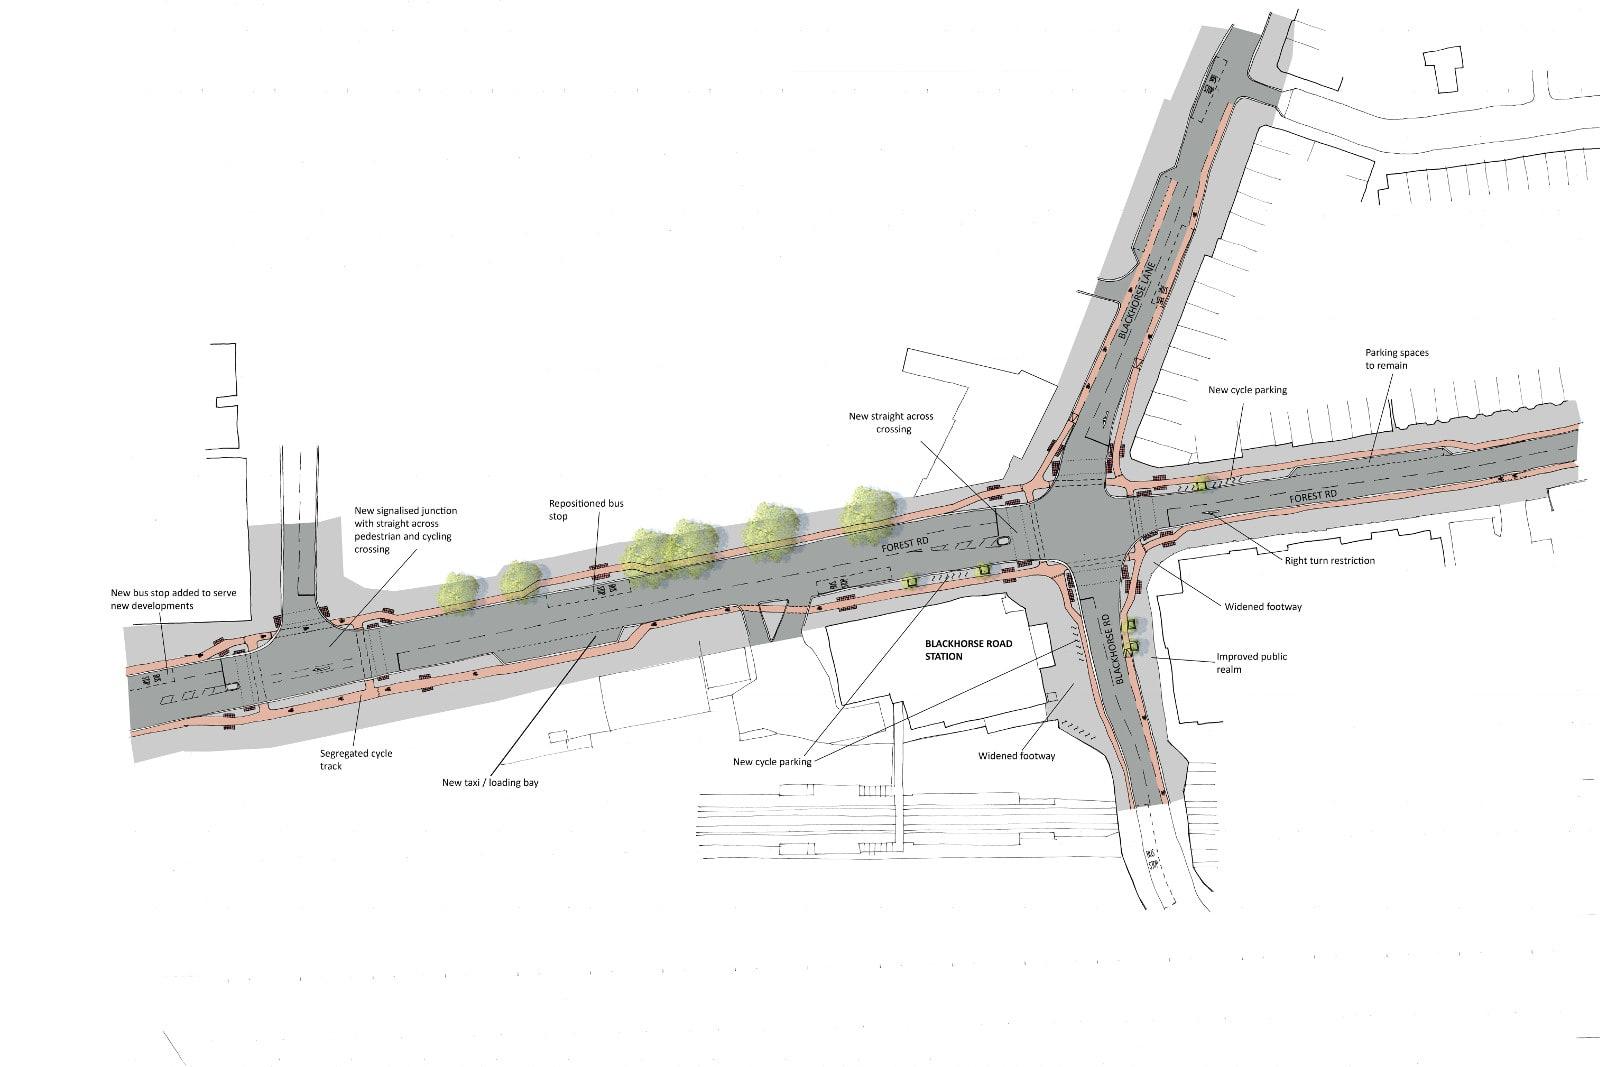 Forest Road Blackhorse Junction Consultation Cyclescape Beam Bridge Diagram